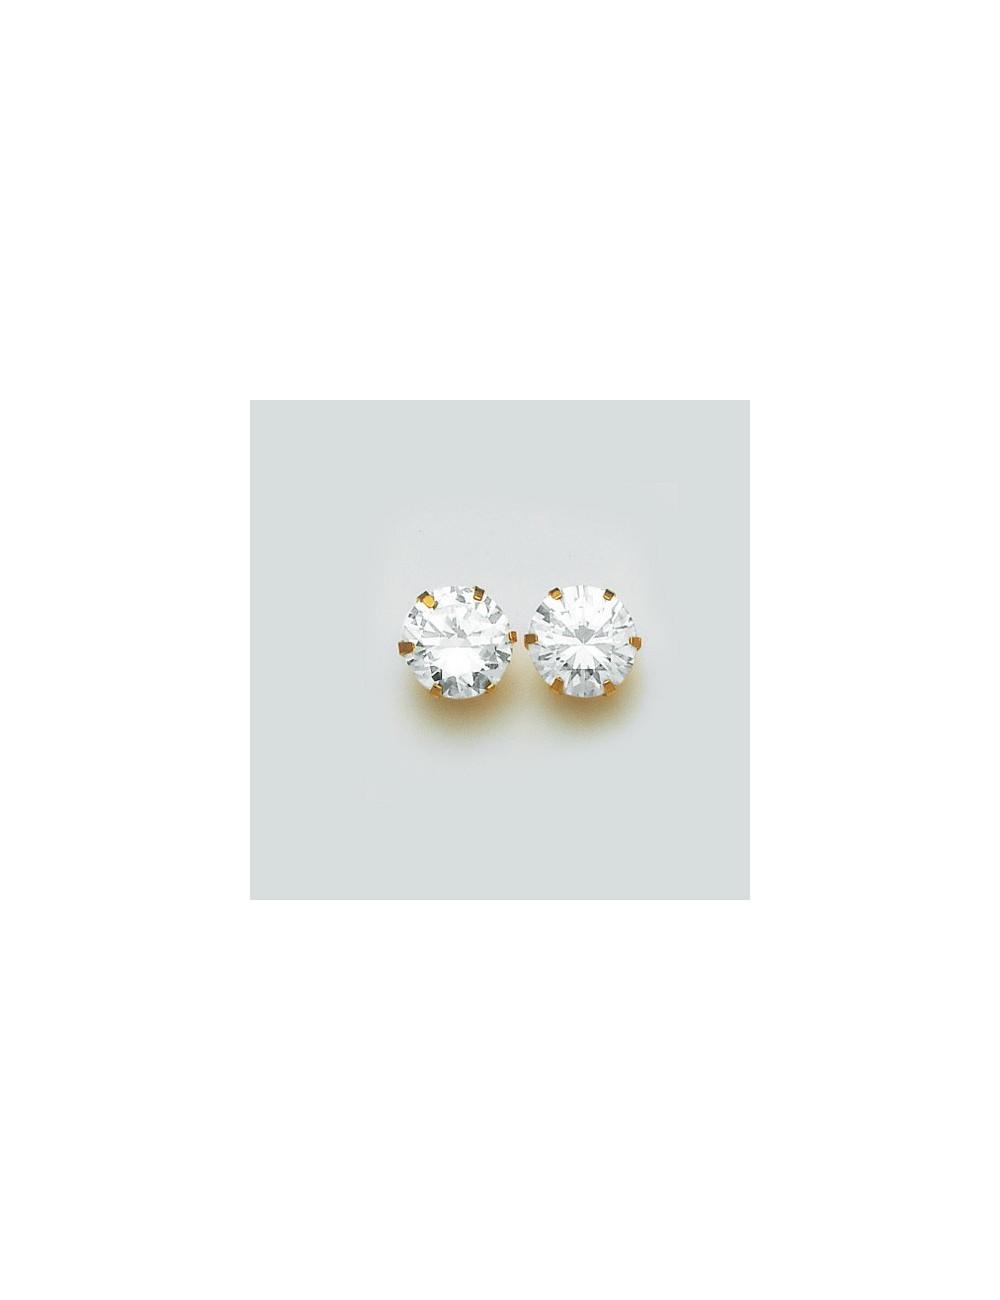 "Boucle d'Oreille ""Puce"" Or 18 carats"